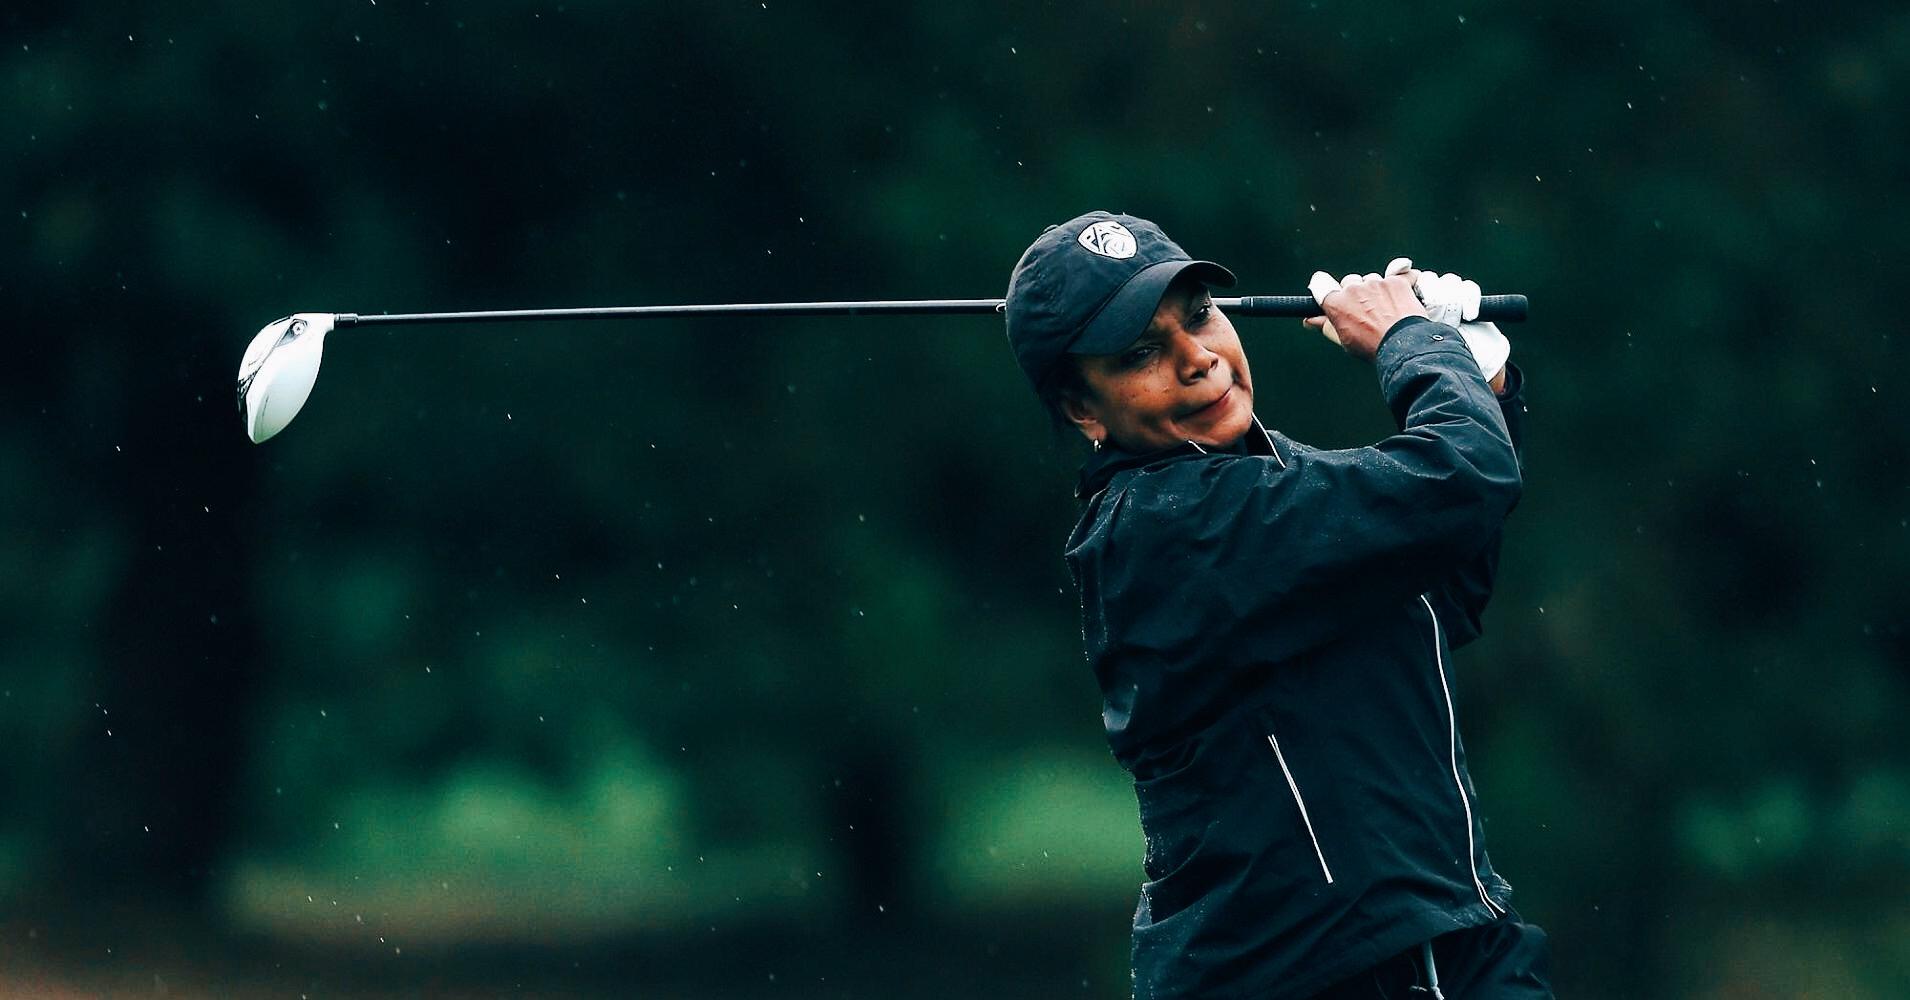 Condoleezza-Rice-success-sport.jpg